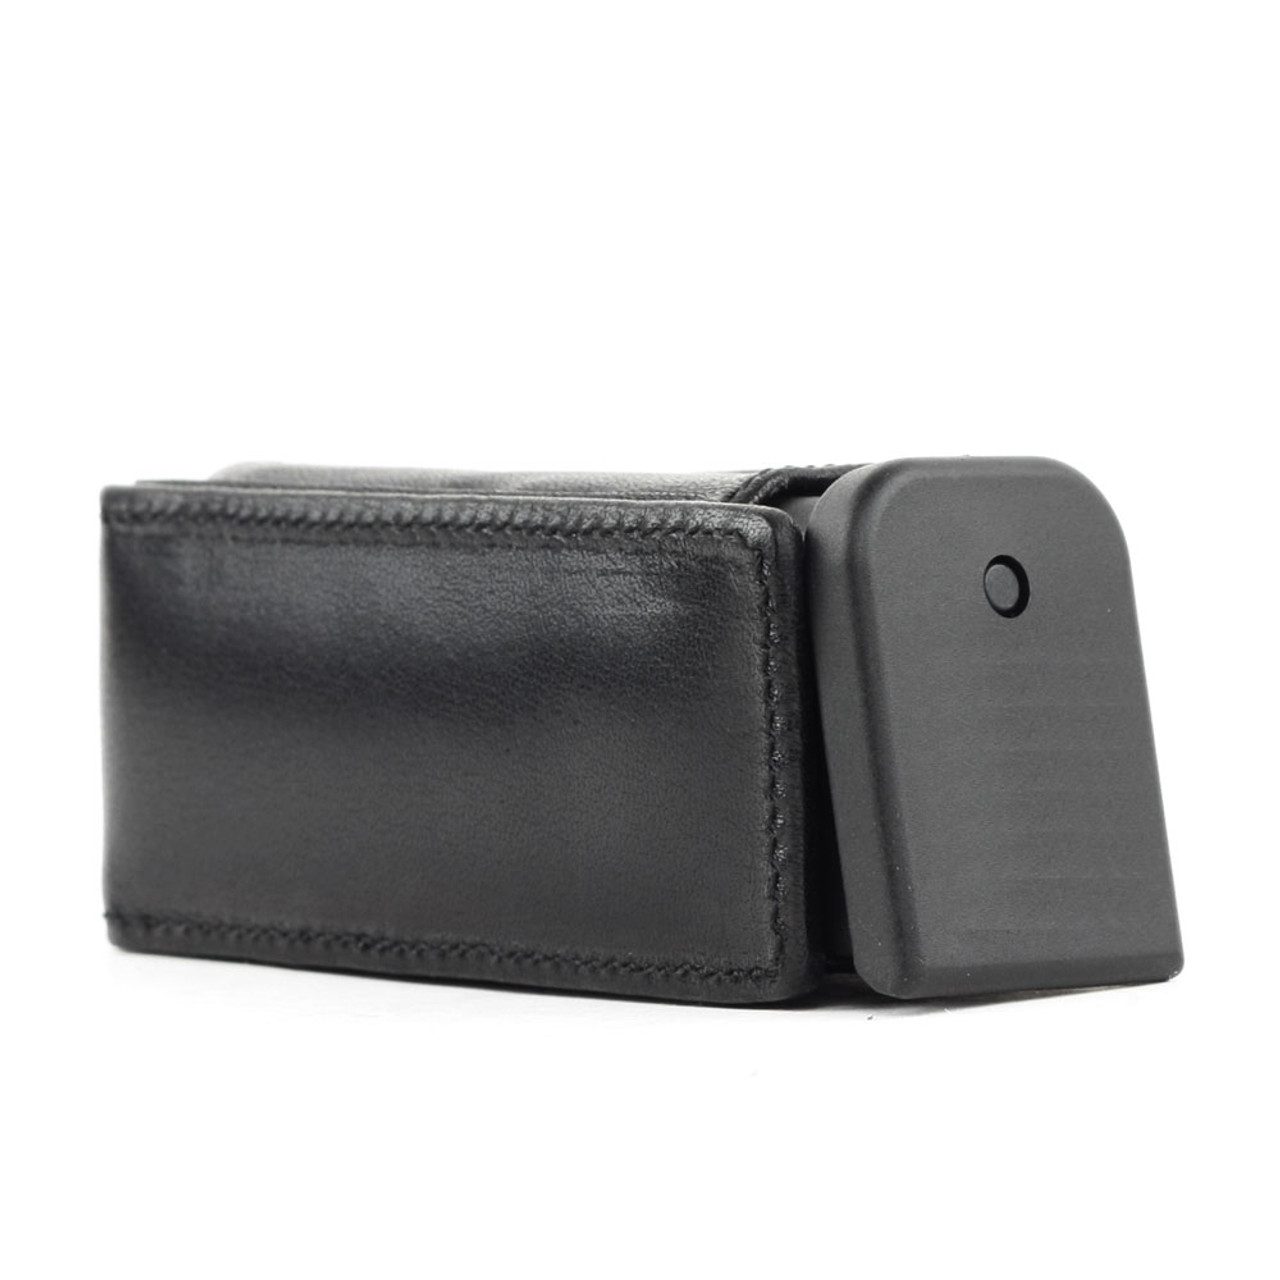 M&P 9c Magazine Pocket Protector